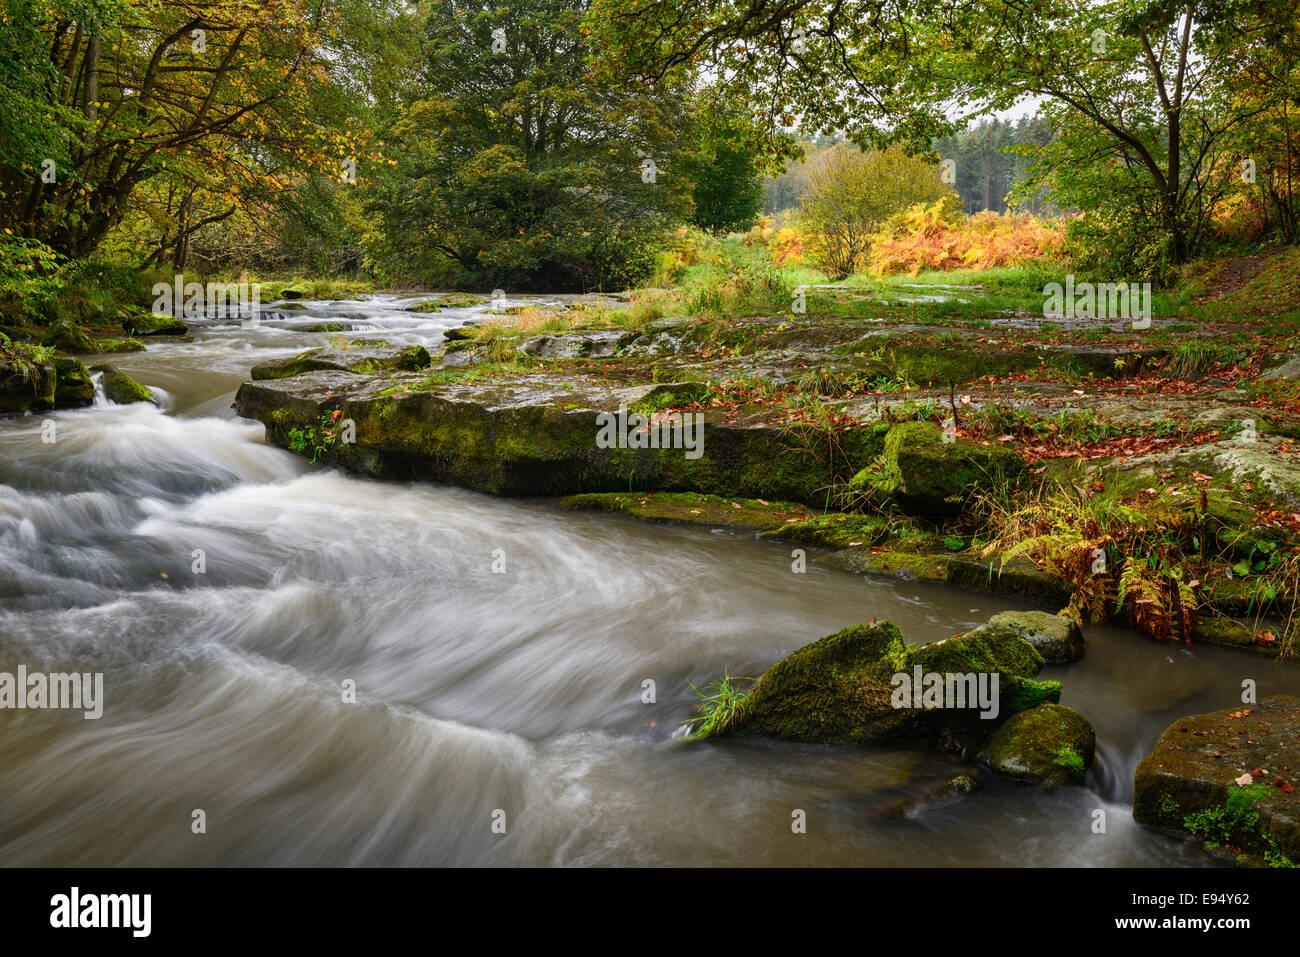 River Derwent near Shotley Grove in 'Shotley Bridge' - Stock Image